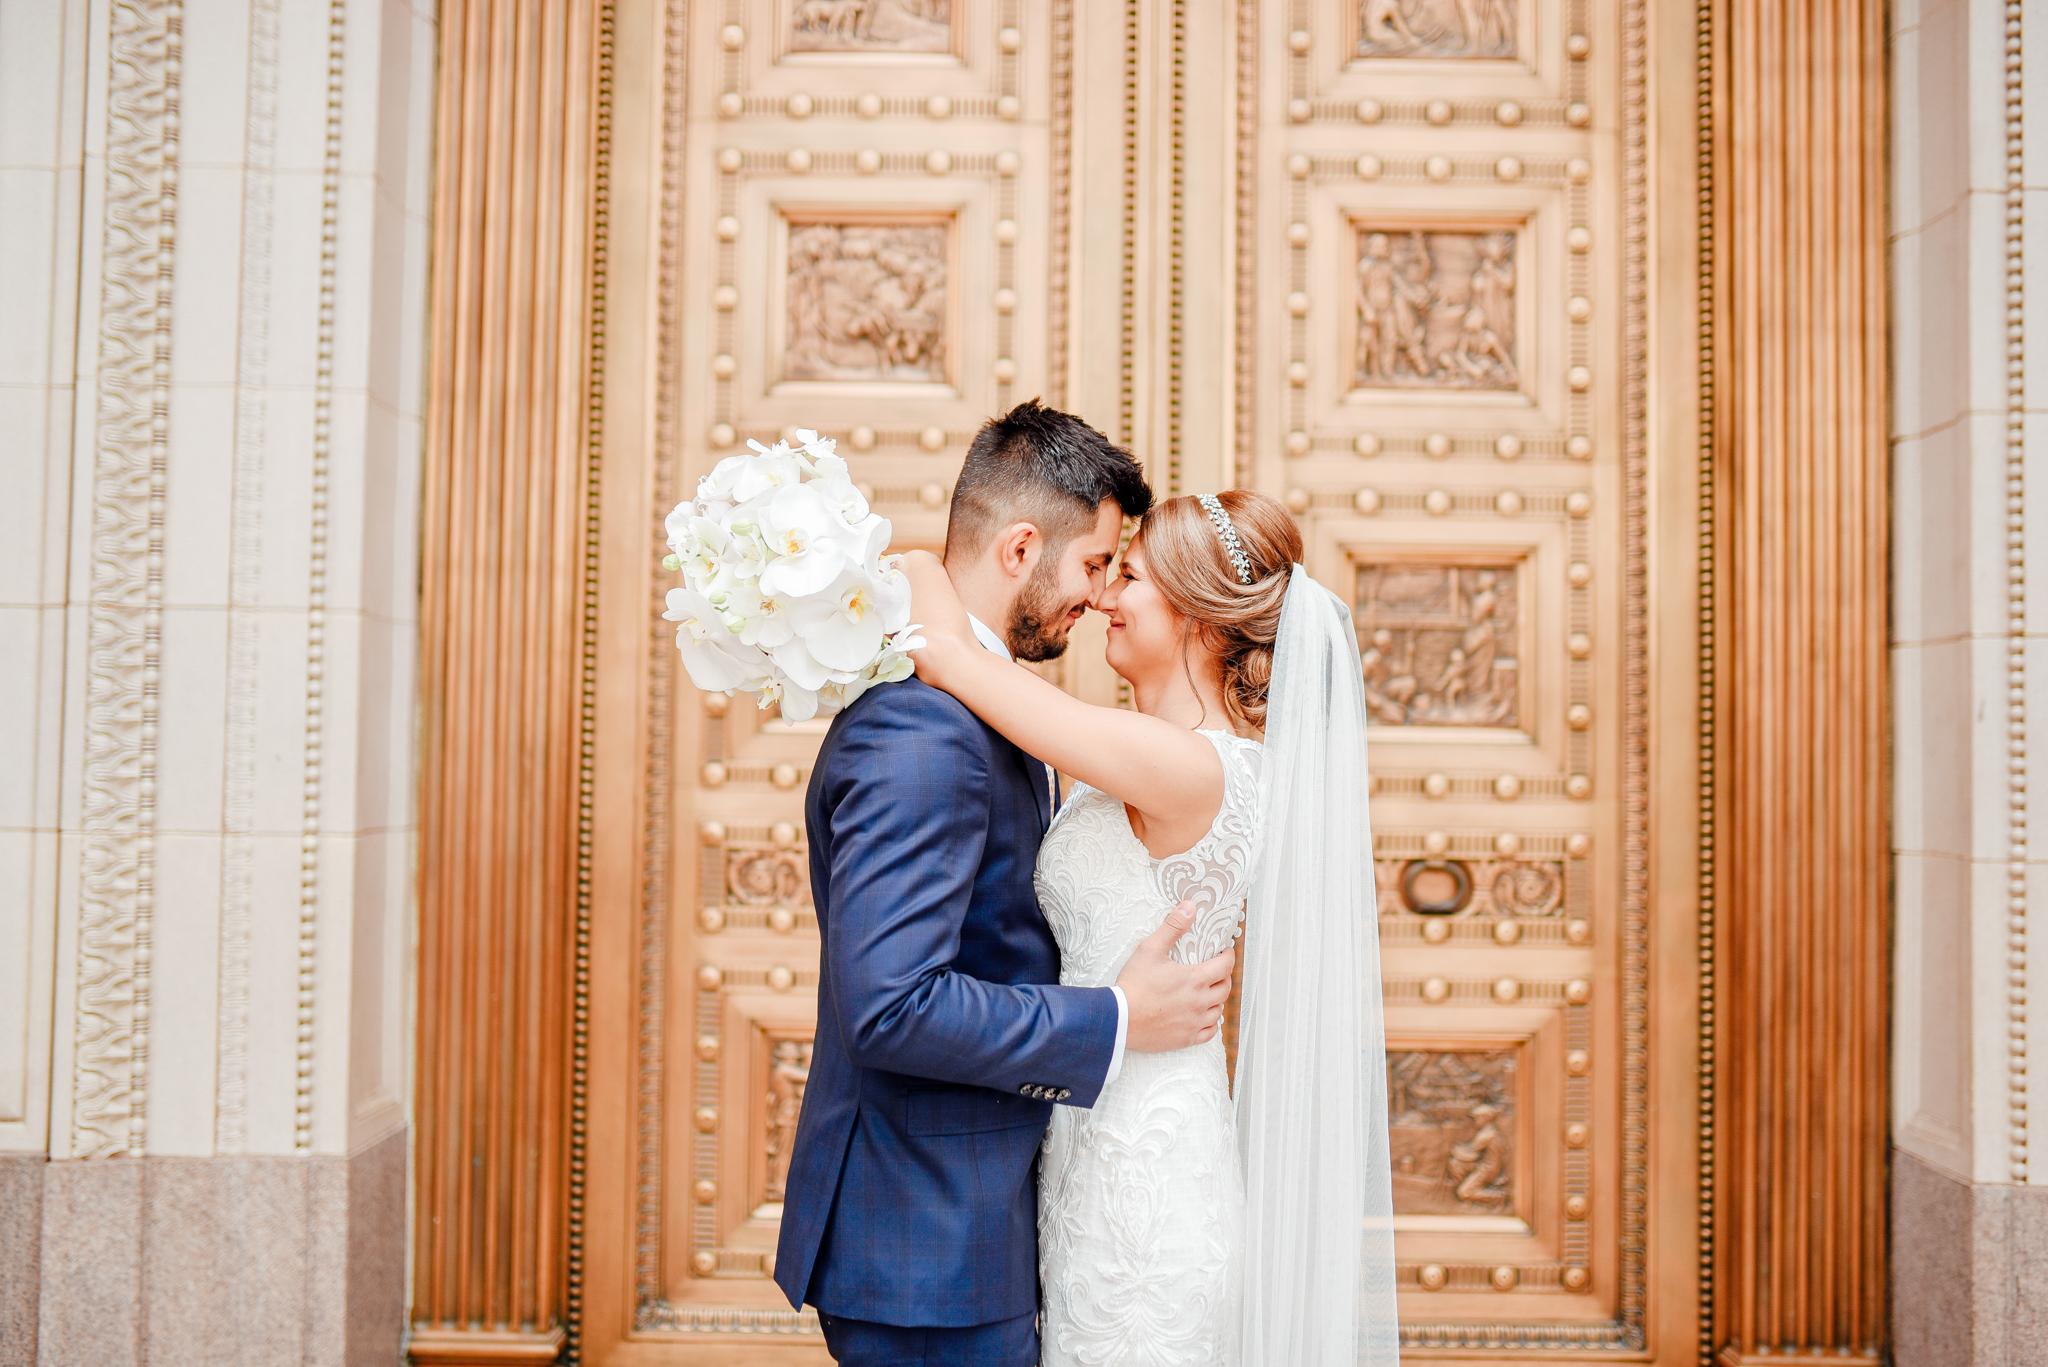 Judy and Theo - Portland Wedding Photographer - 26.jpg